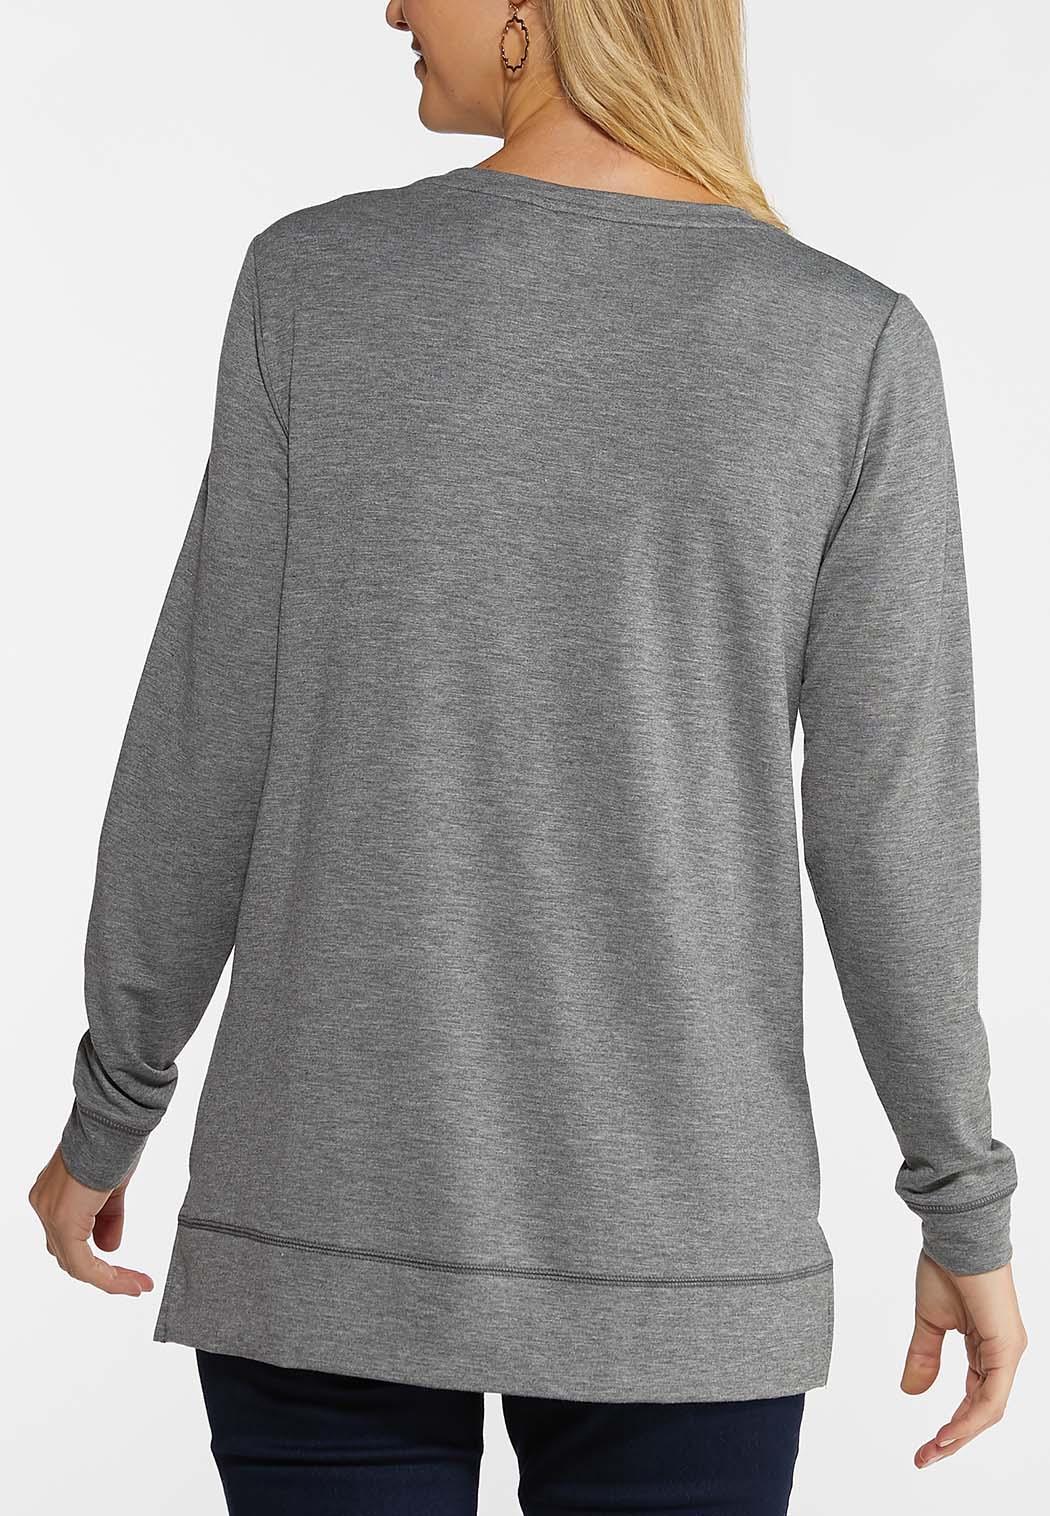 Plaid Joy Sweatshirt (Item #44047162)